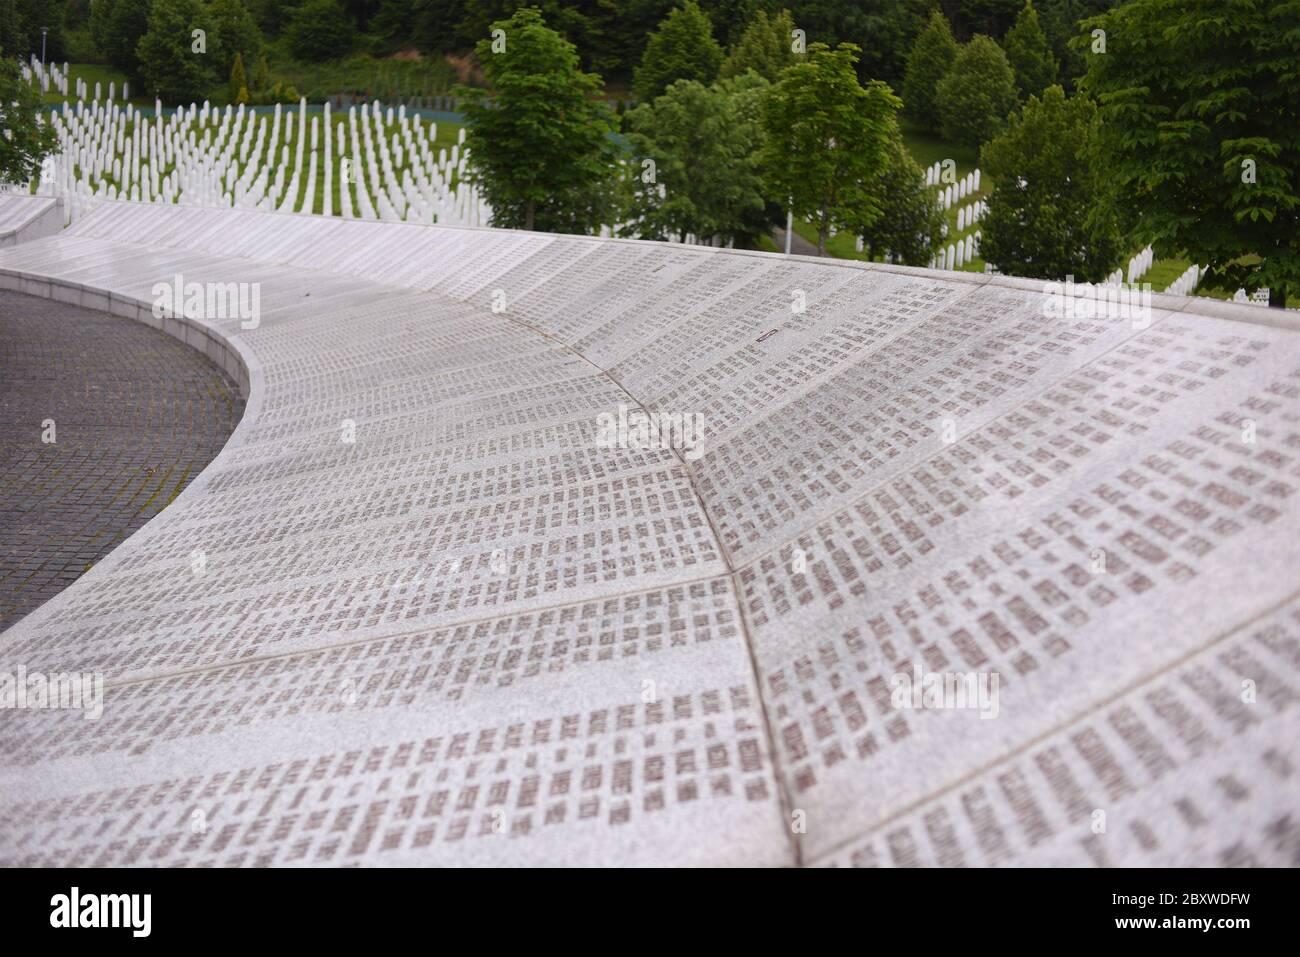 Srebrenica, Bosnia-Herzegovina, June 01 2020: Srebrenica-Potocari memorial and cemetery for the victims of the 1995 massacre Stock Photo